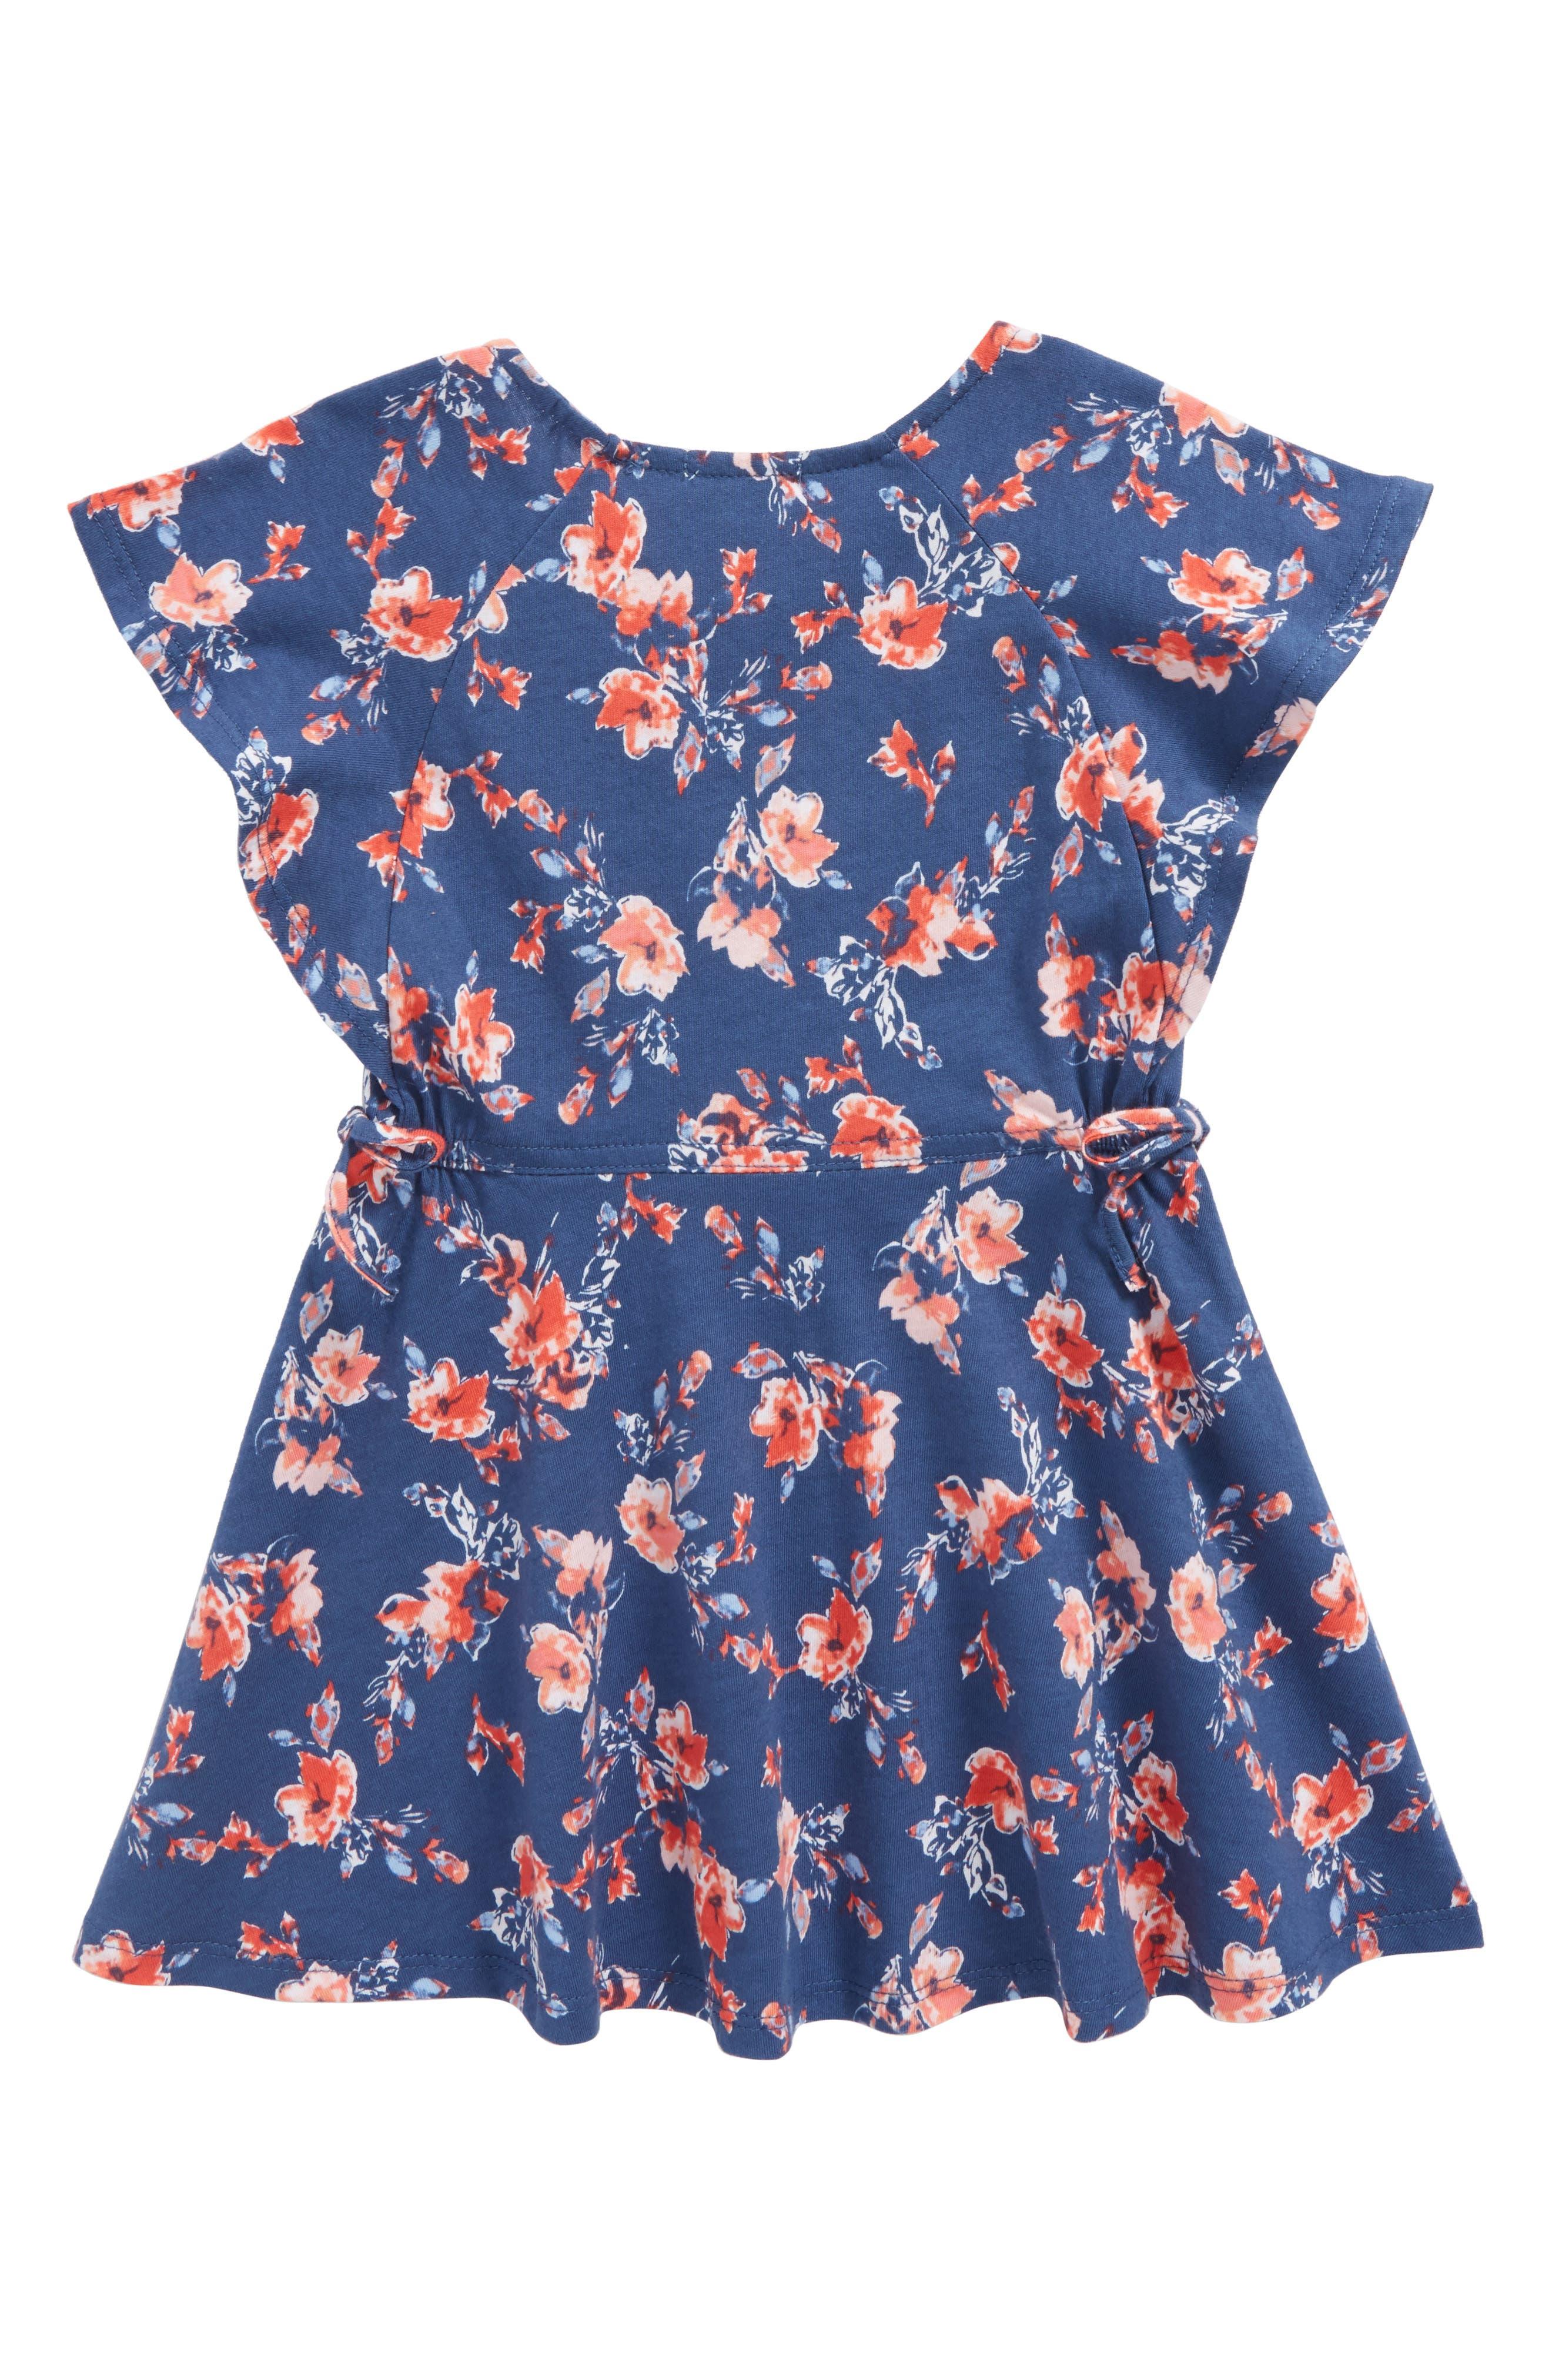 Ruffle Dress,                             Alternate thumbnail 2, color,                             430